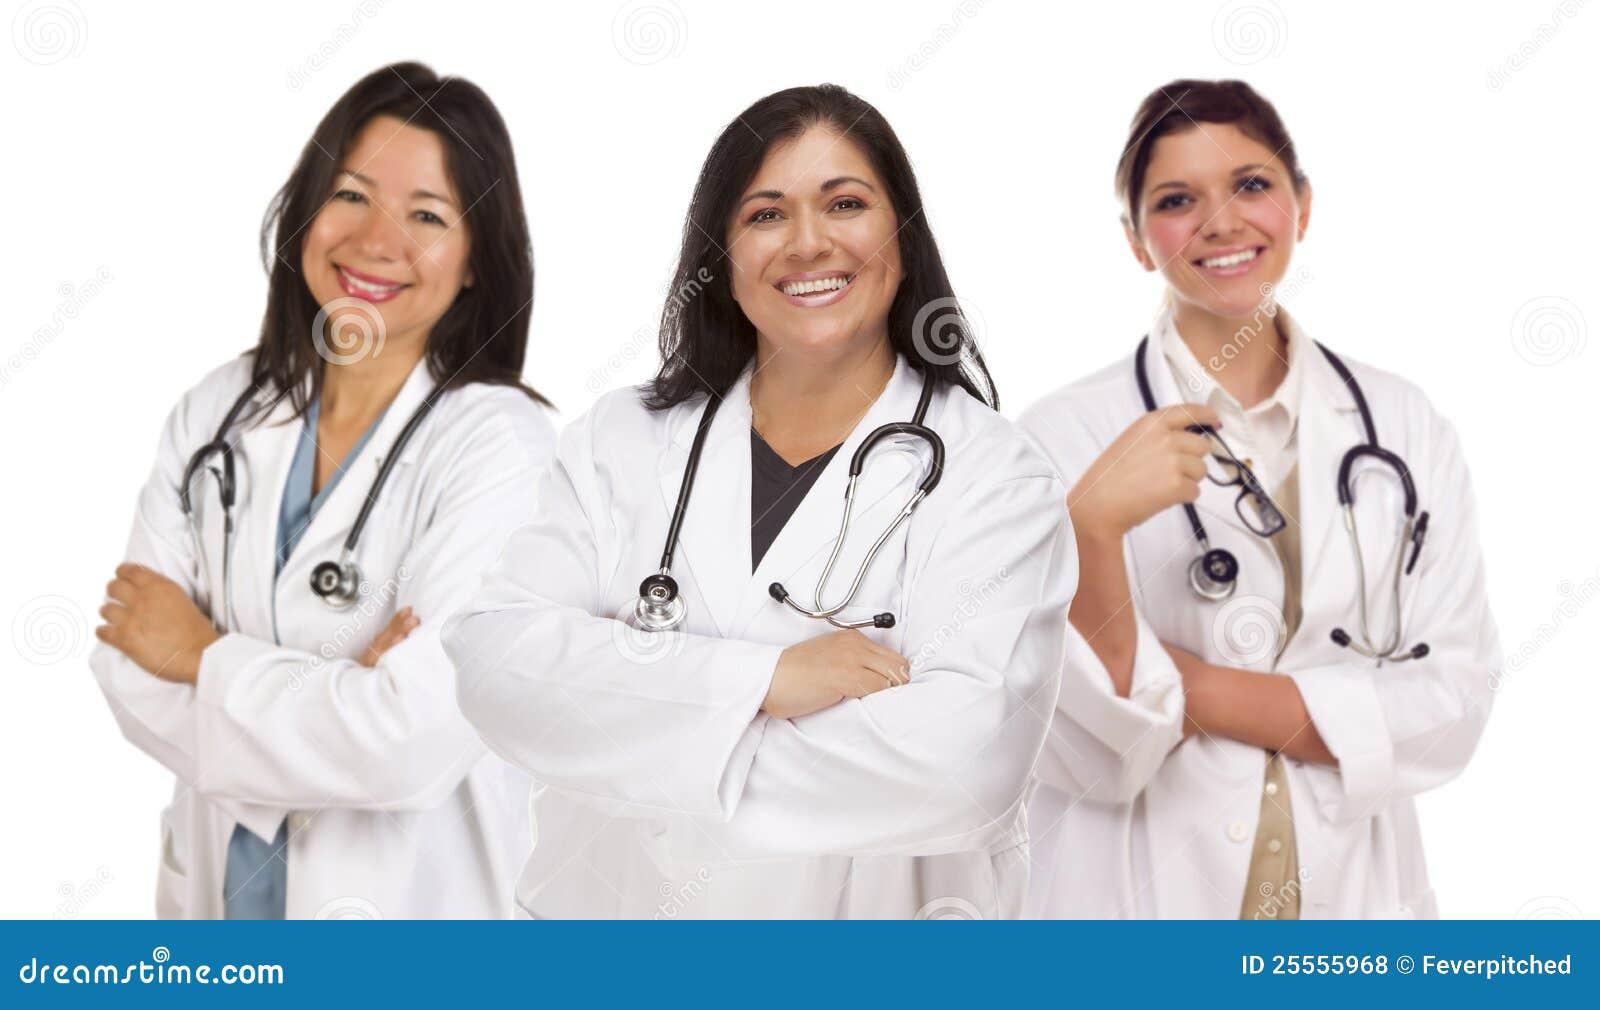 ,#untitled | Nurse outfit scrubs, Nursing clothes, Nurse